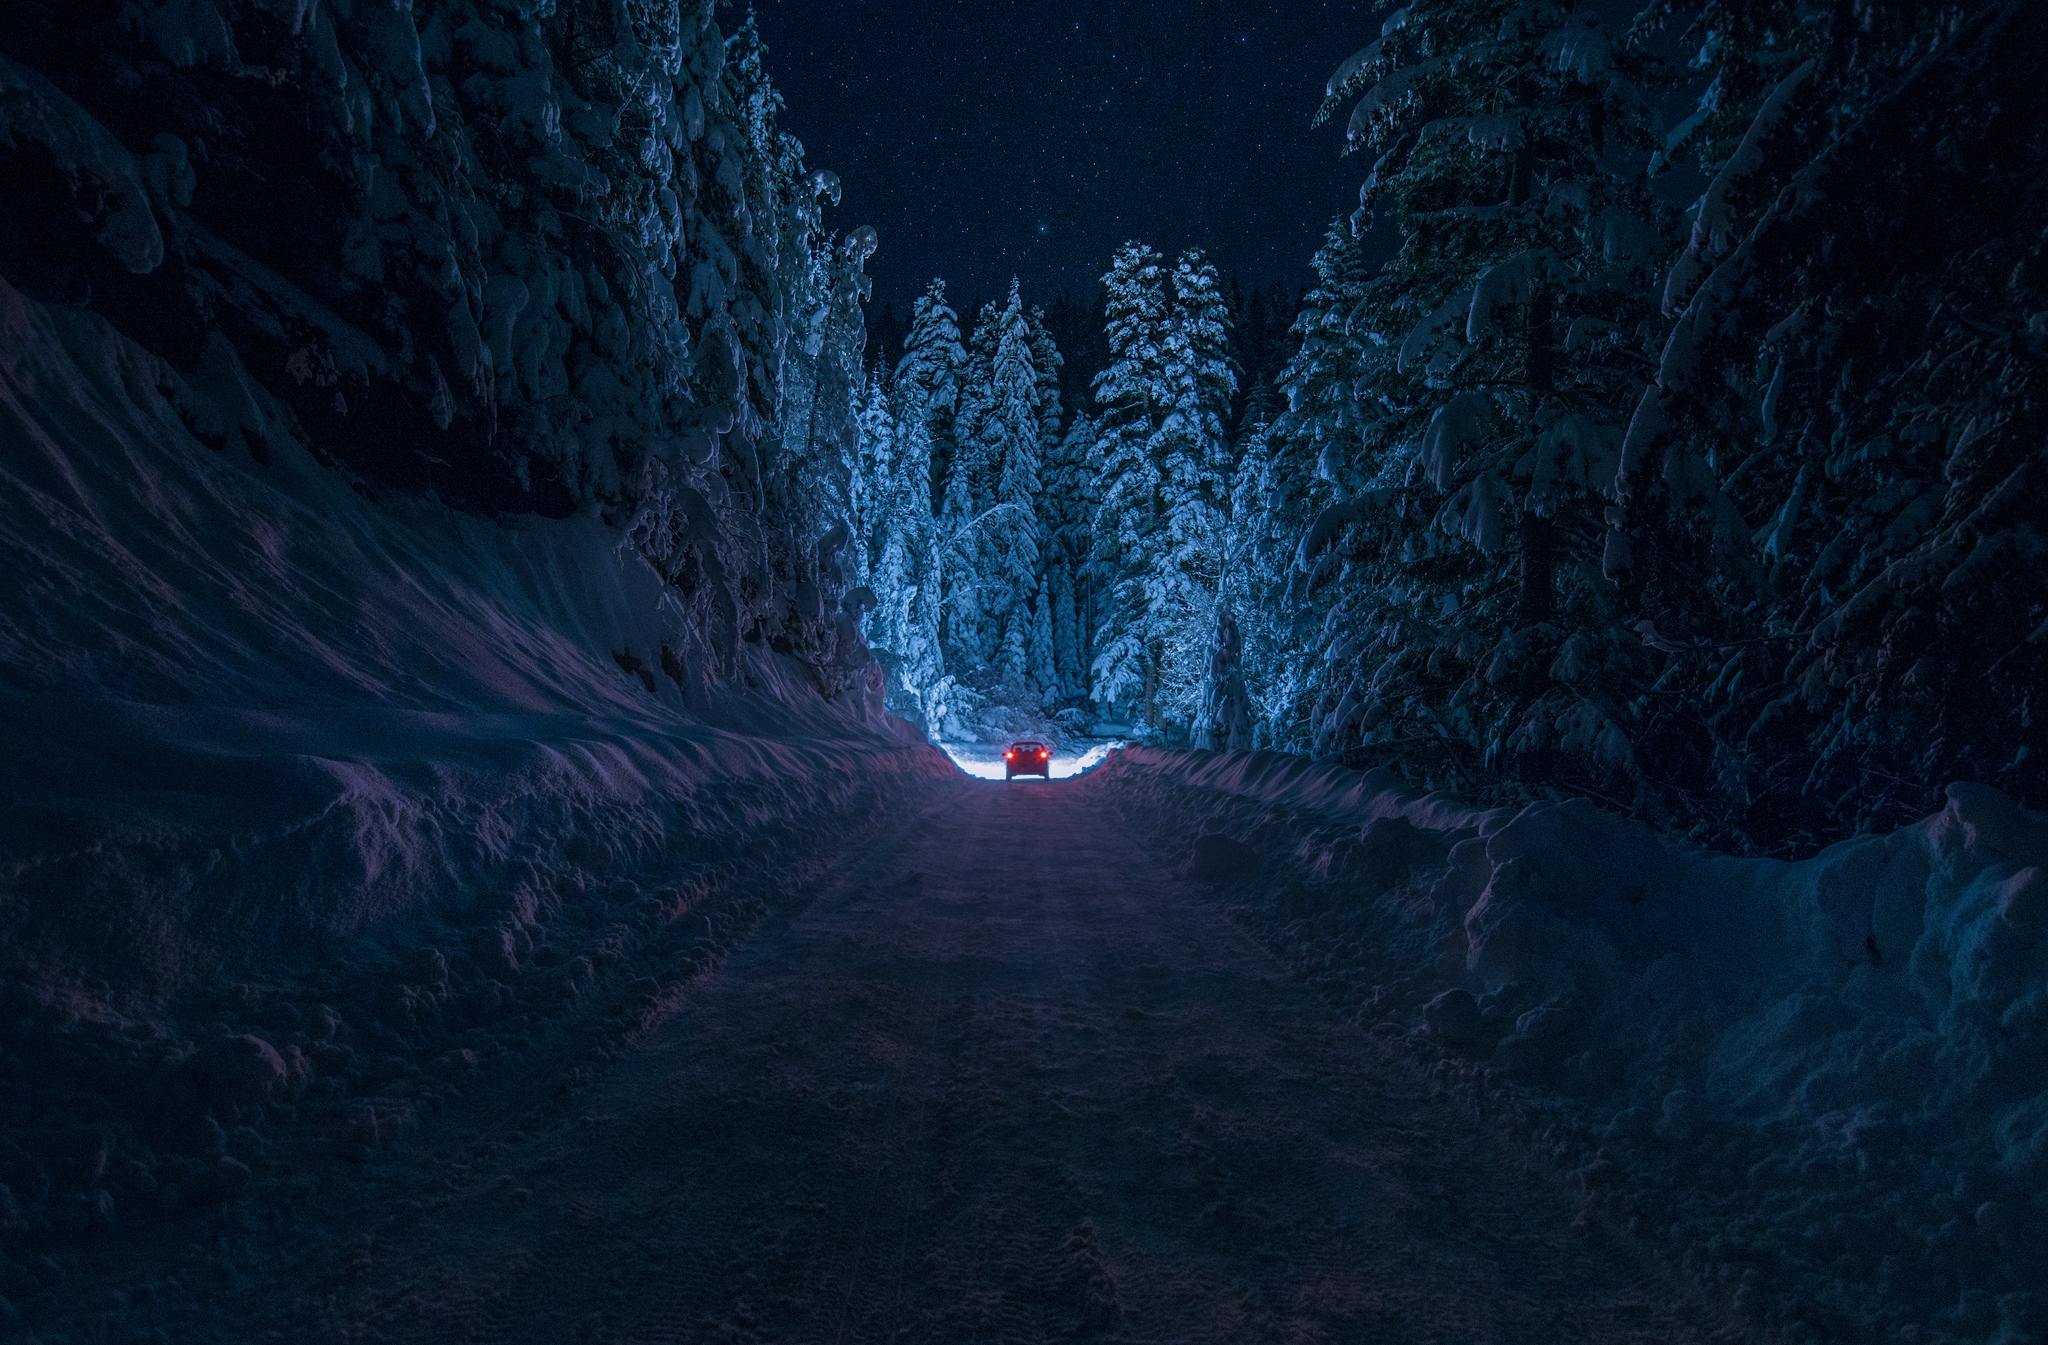 Ночь снег зима бесплатно